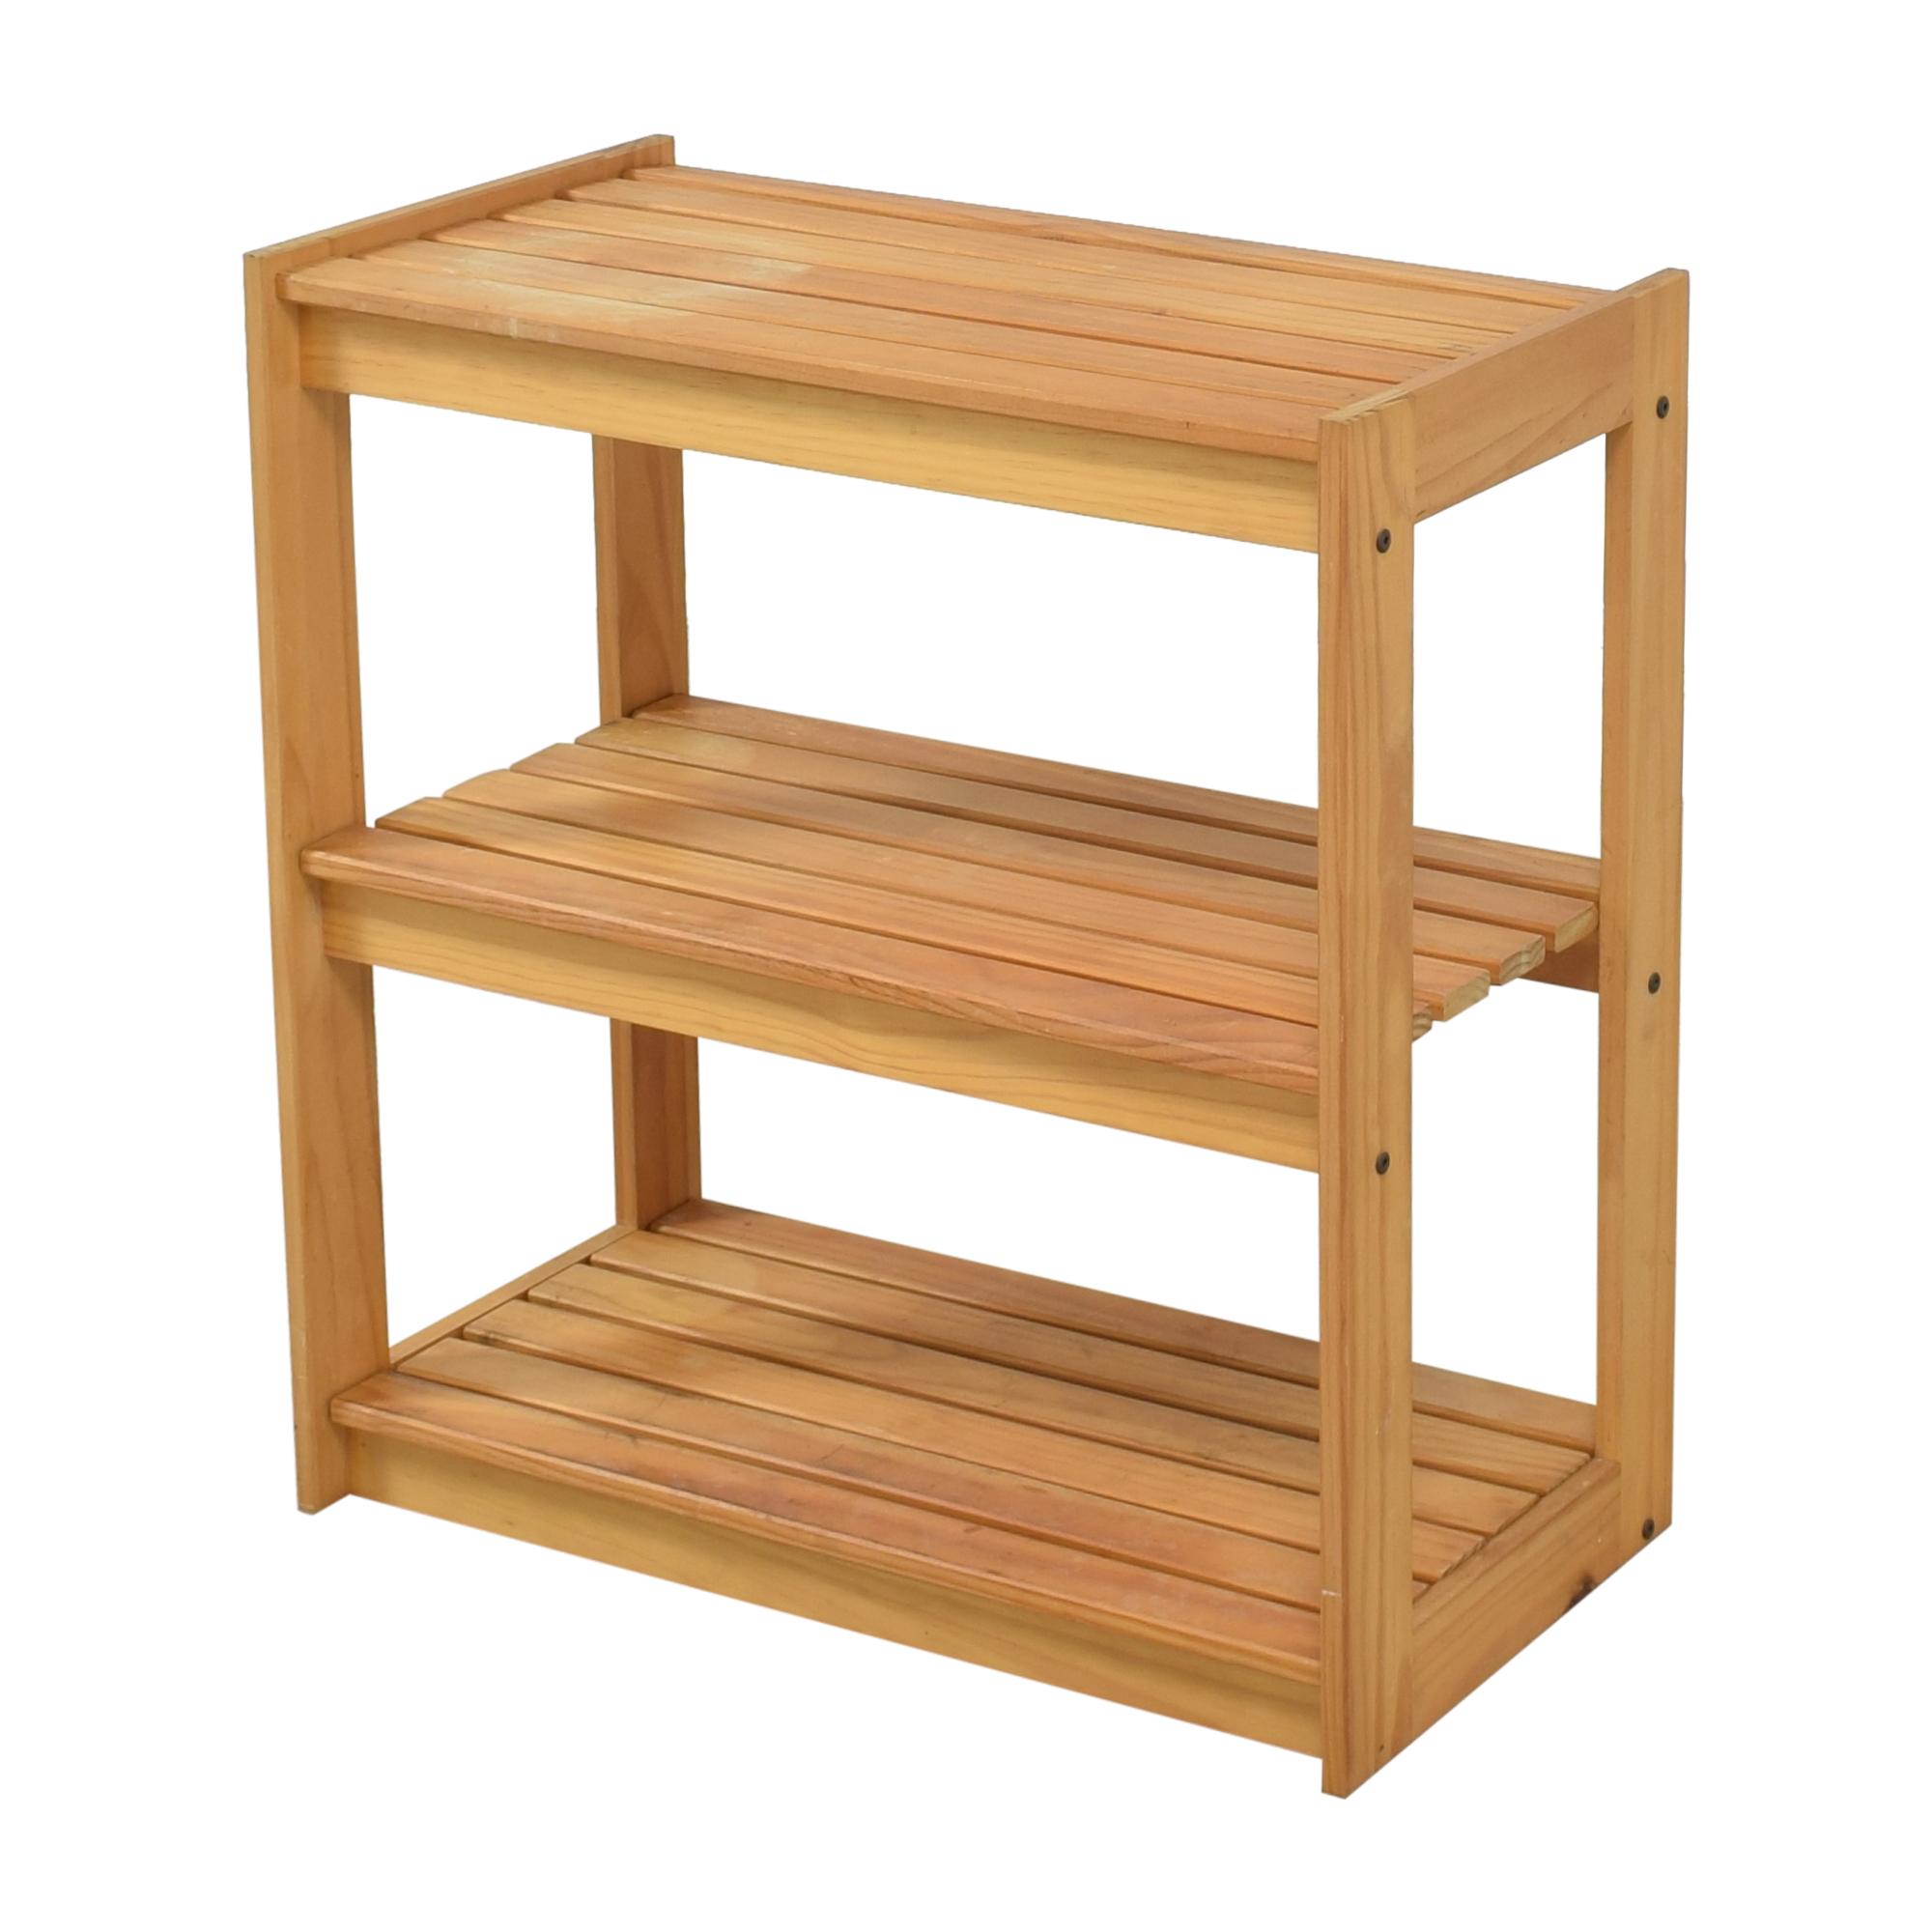 Hold Everything Hold Everything Three Tier Storage Shelf price